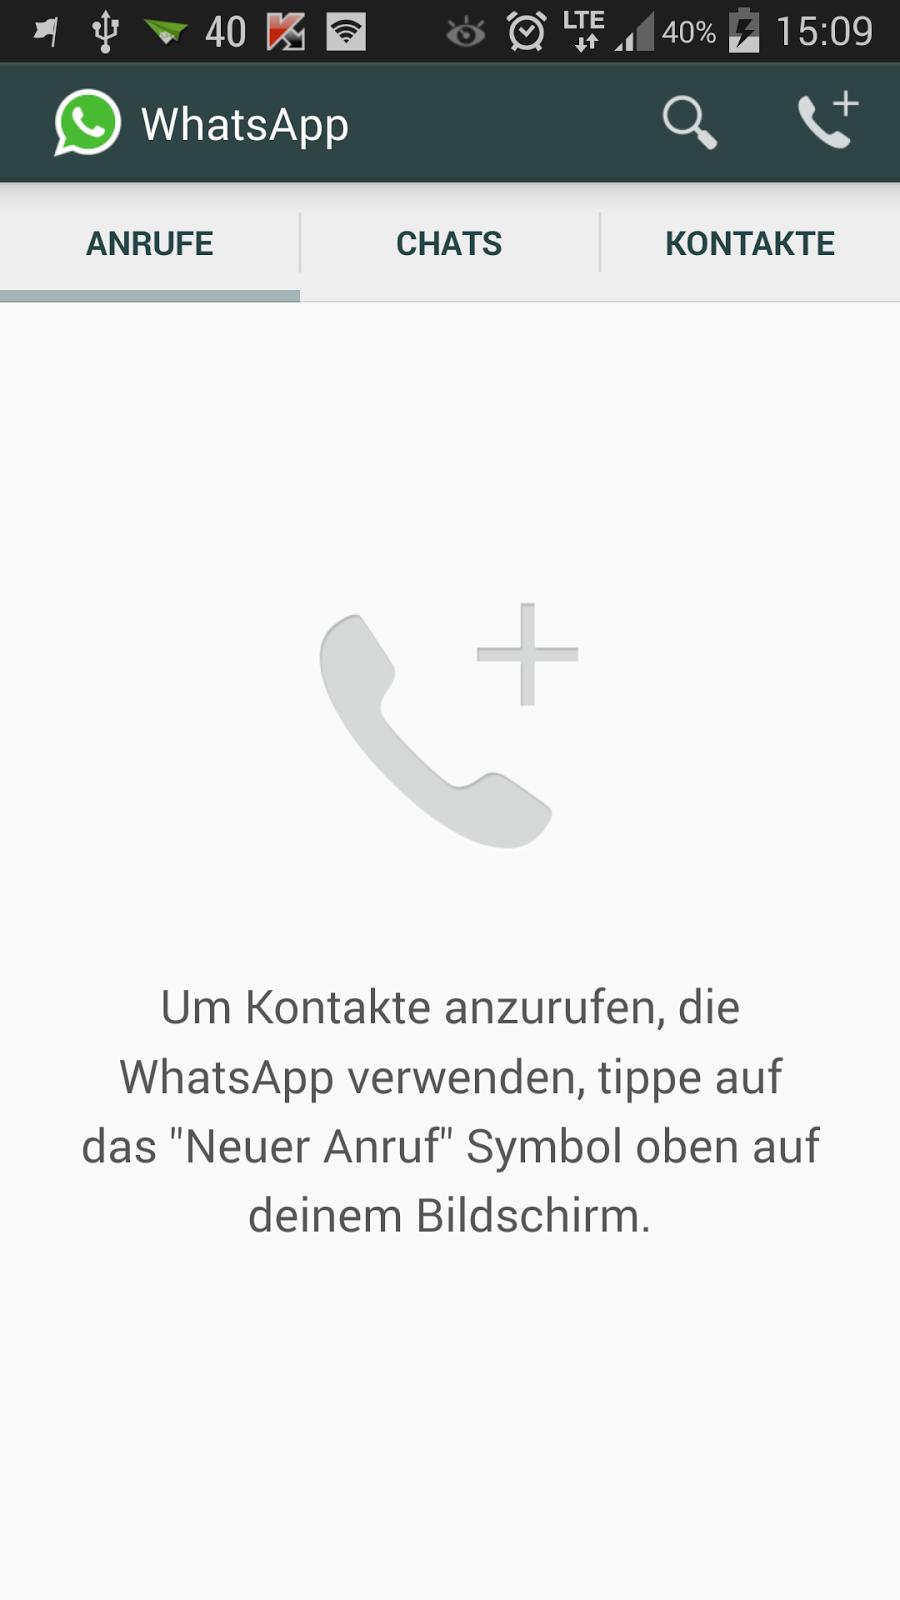 Screenshot 2015 03 31 15 09 59